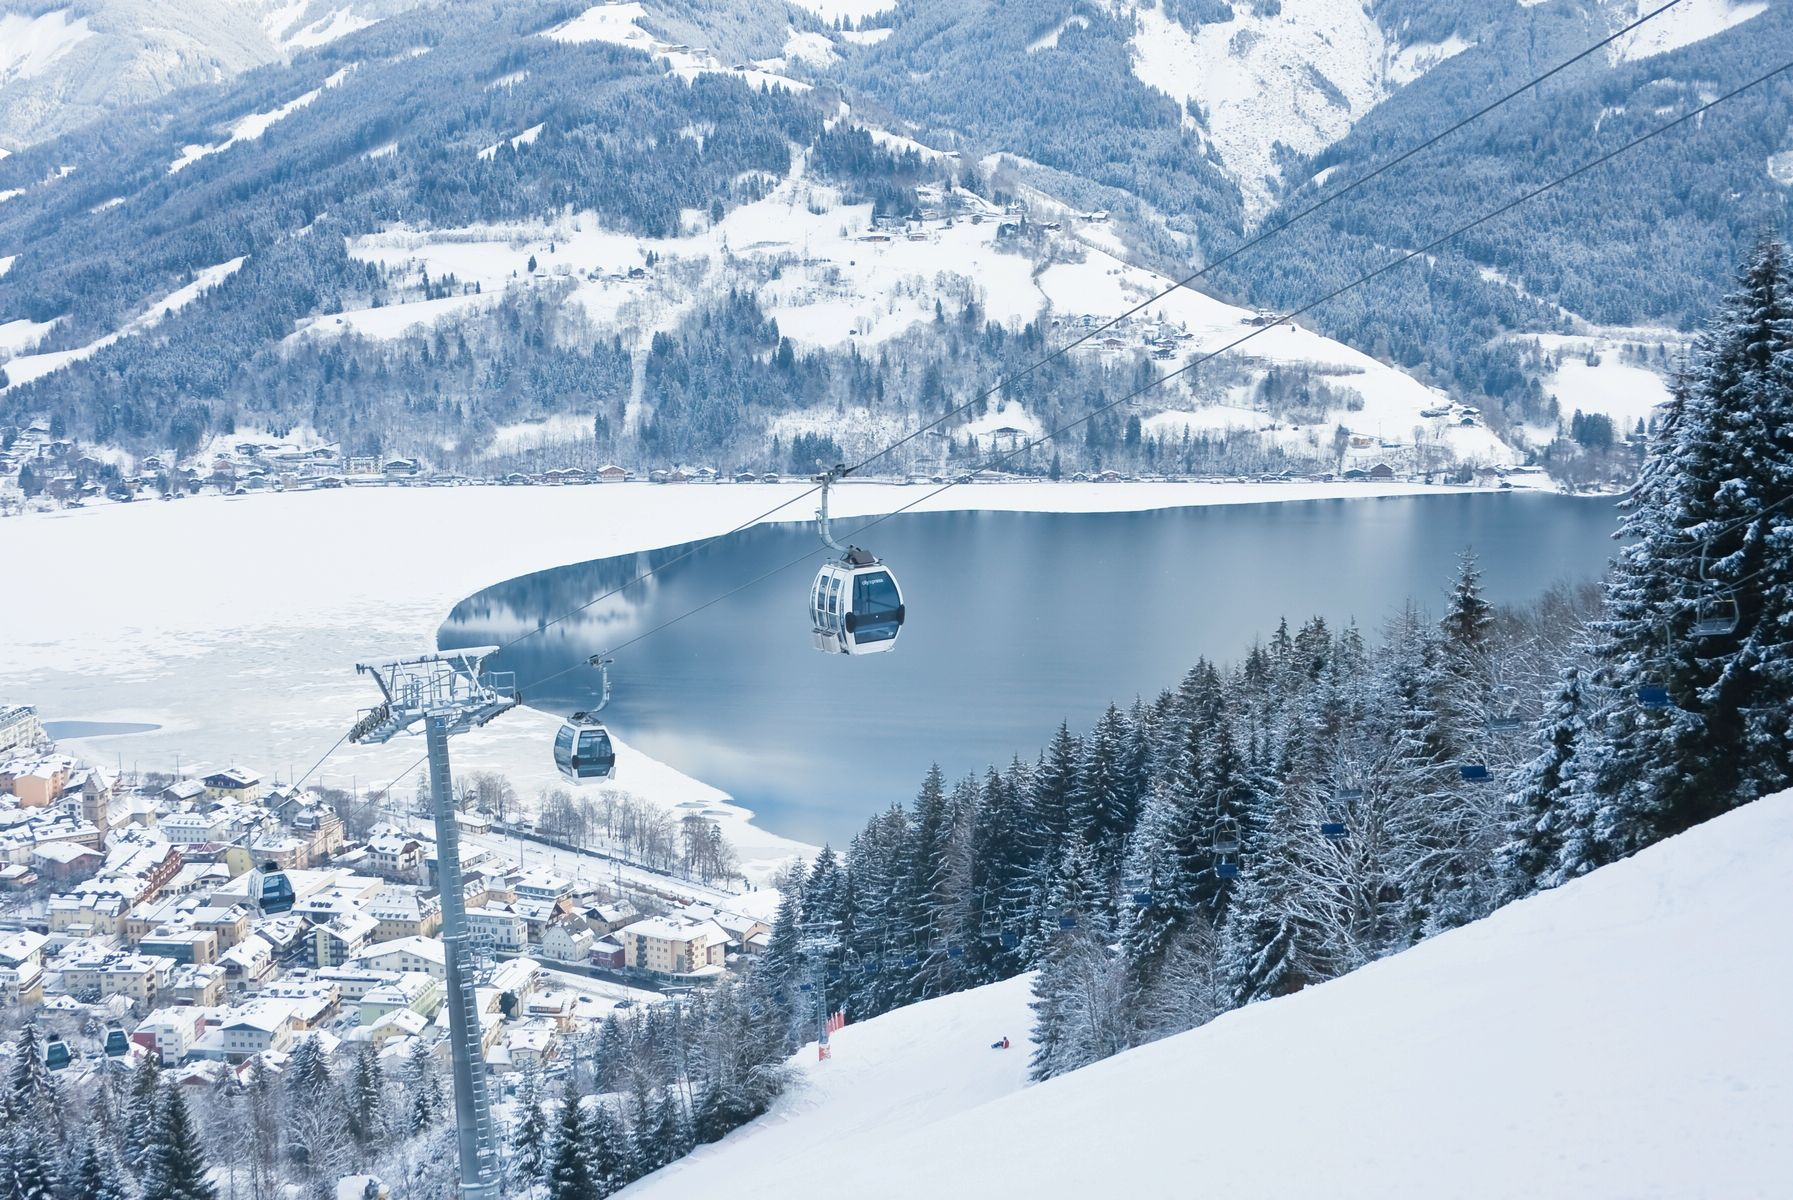 Открывая Целль ам Зее - Капрун! Курорты Австрии!